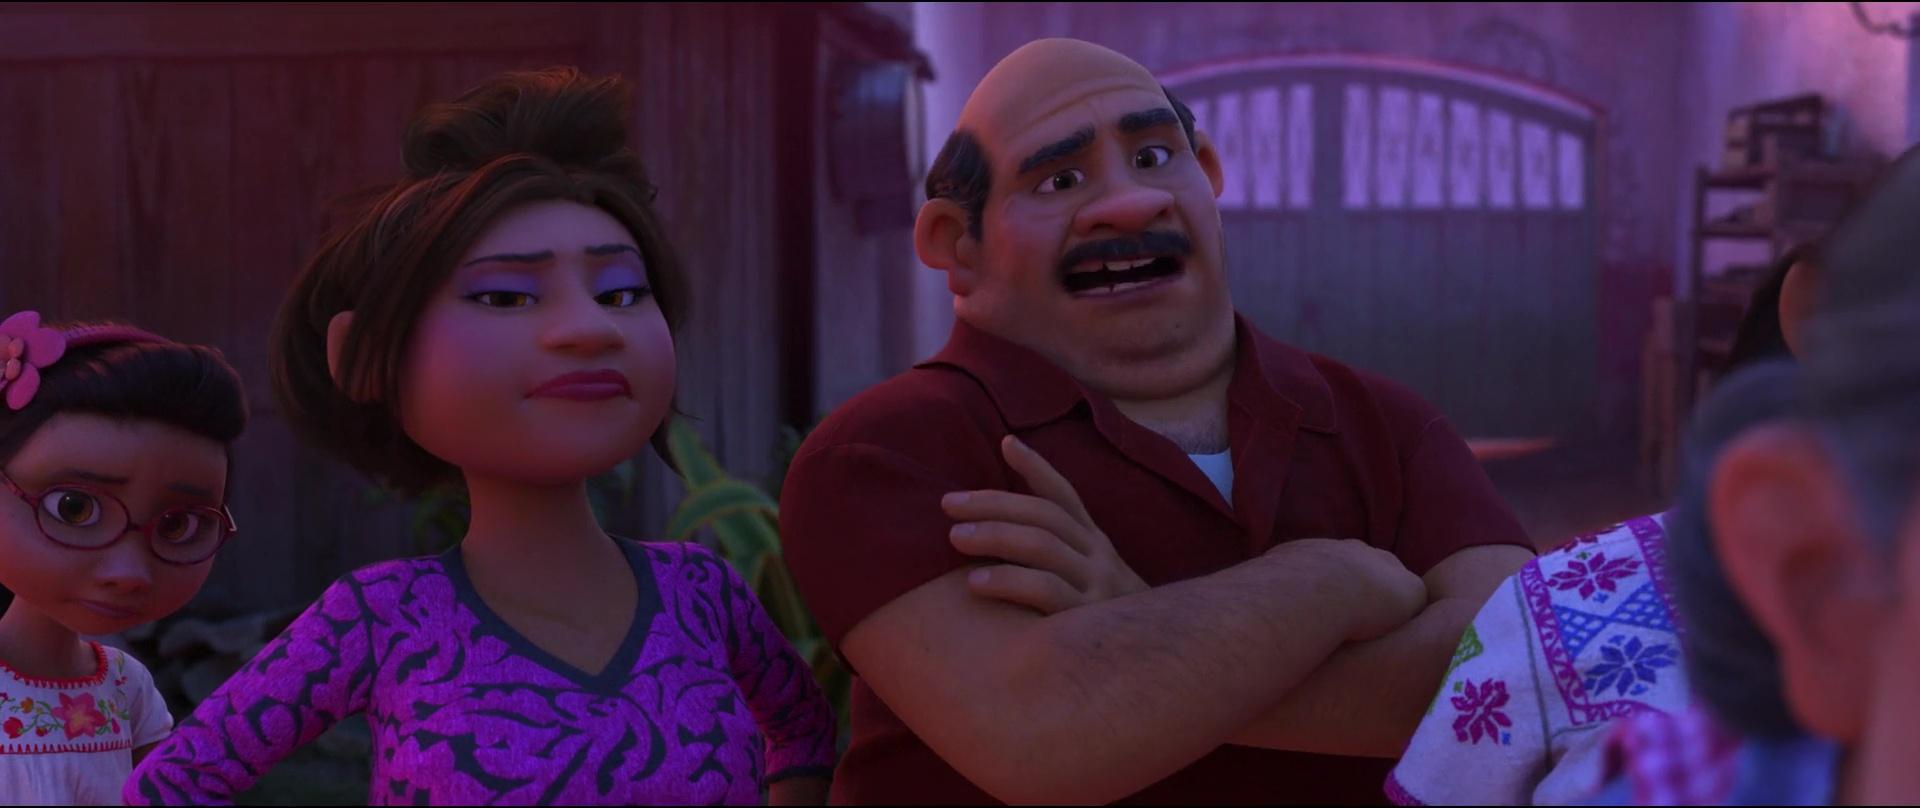 tio berto rivera personnage character coco disney pixar